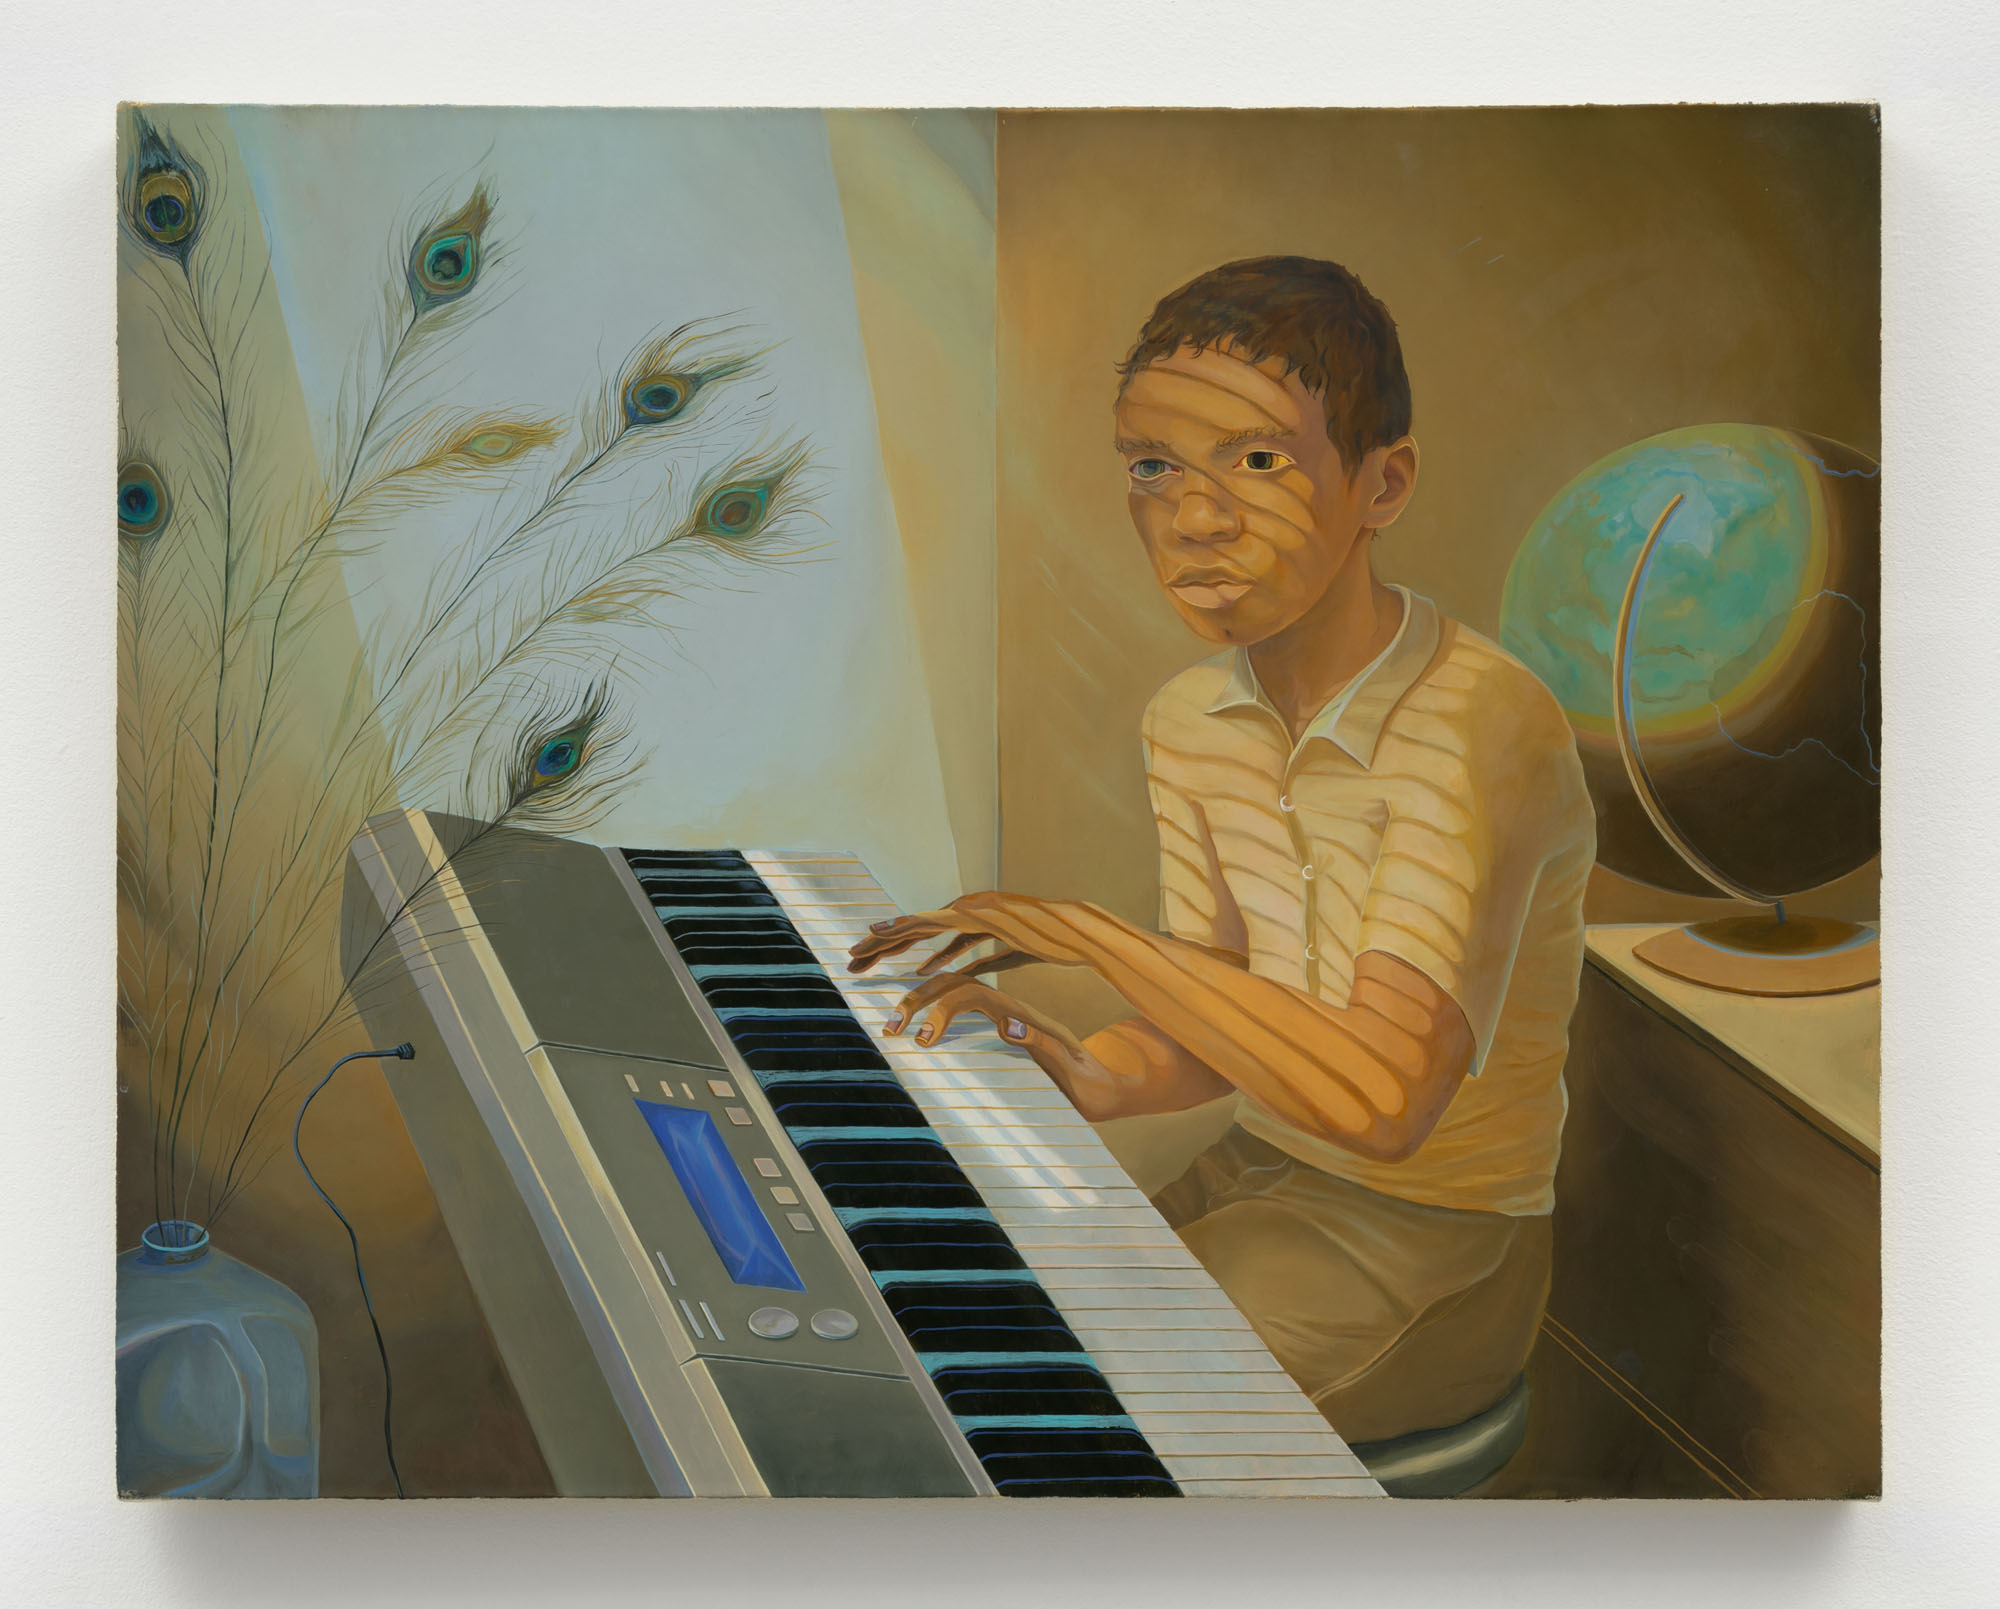 Aaron Gilbert    Judah , 2012-2013  Oil on canvas  24 x 30 inches